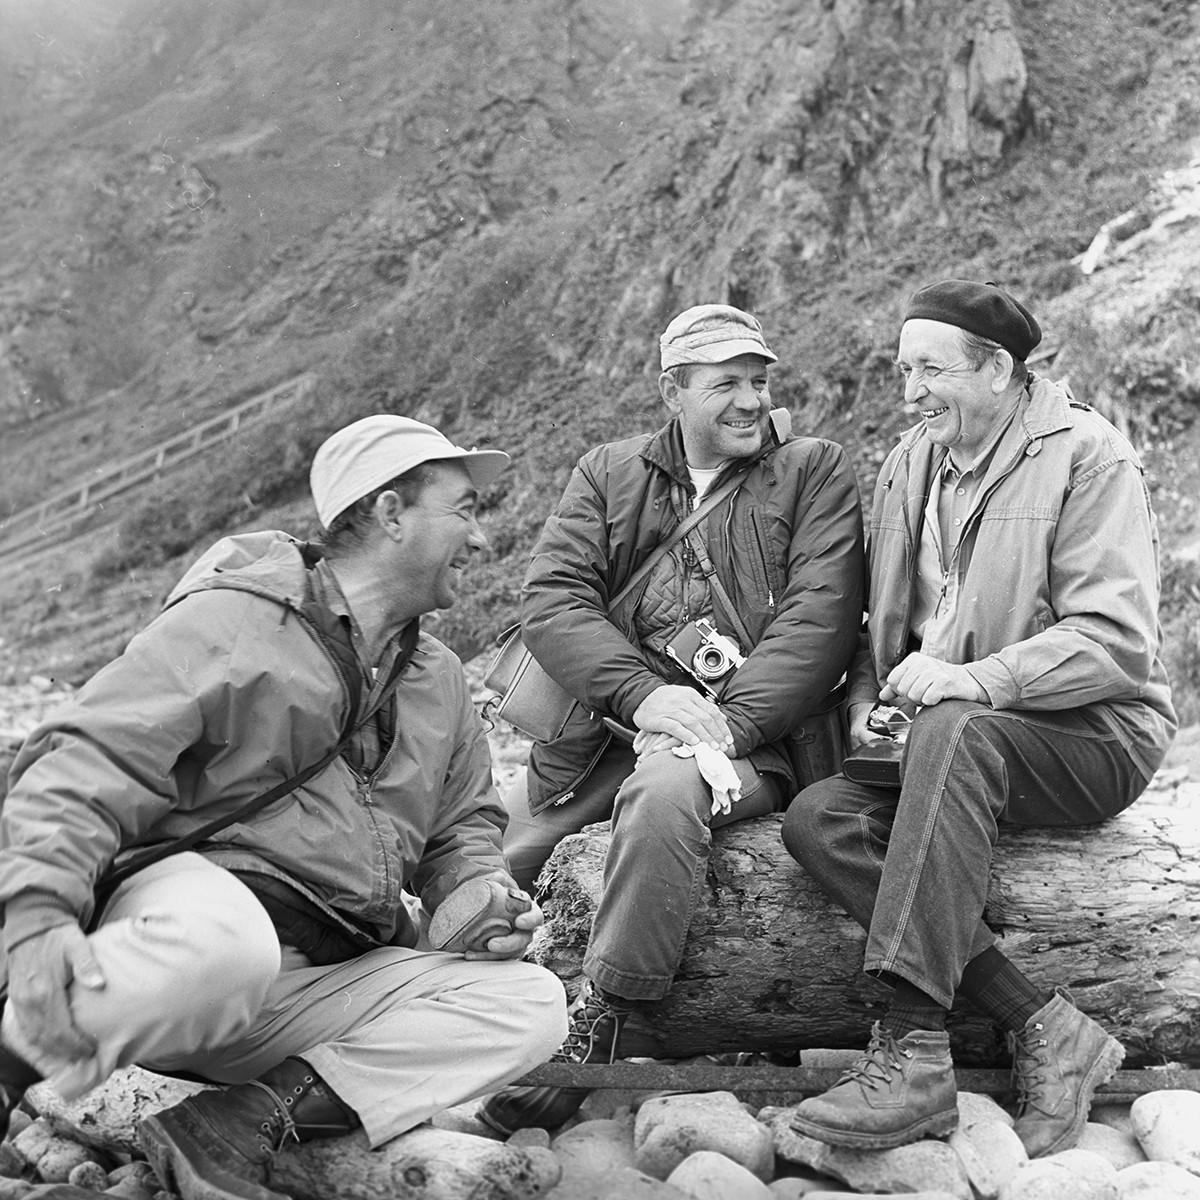 Američki naučnici Kliford Fiskus, Ansel Džonsom i kandidat bioloških nauka Viktor Arsenjjev (desno) na ostrovu Medni. Komandorska ostrva.